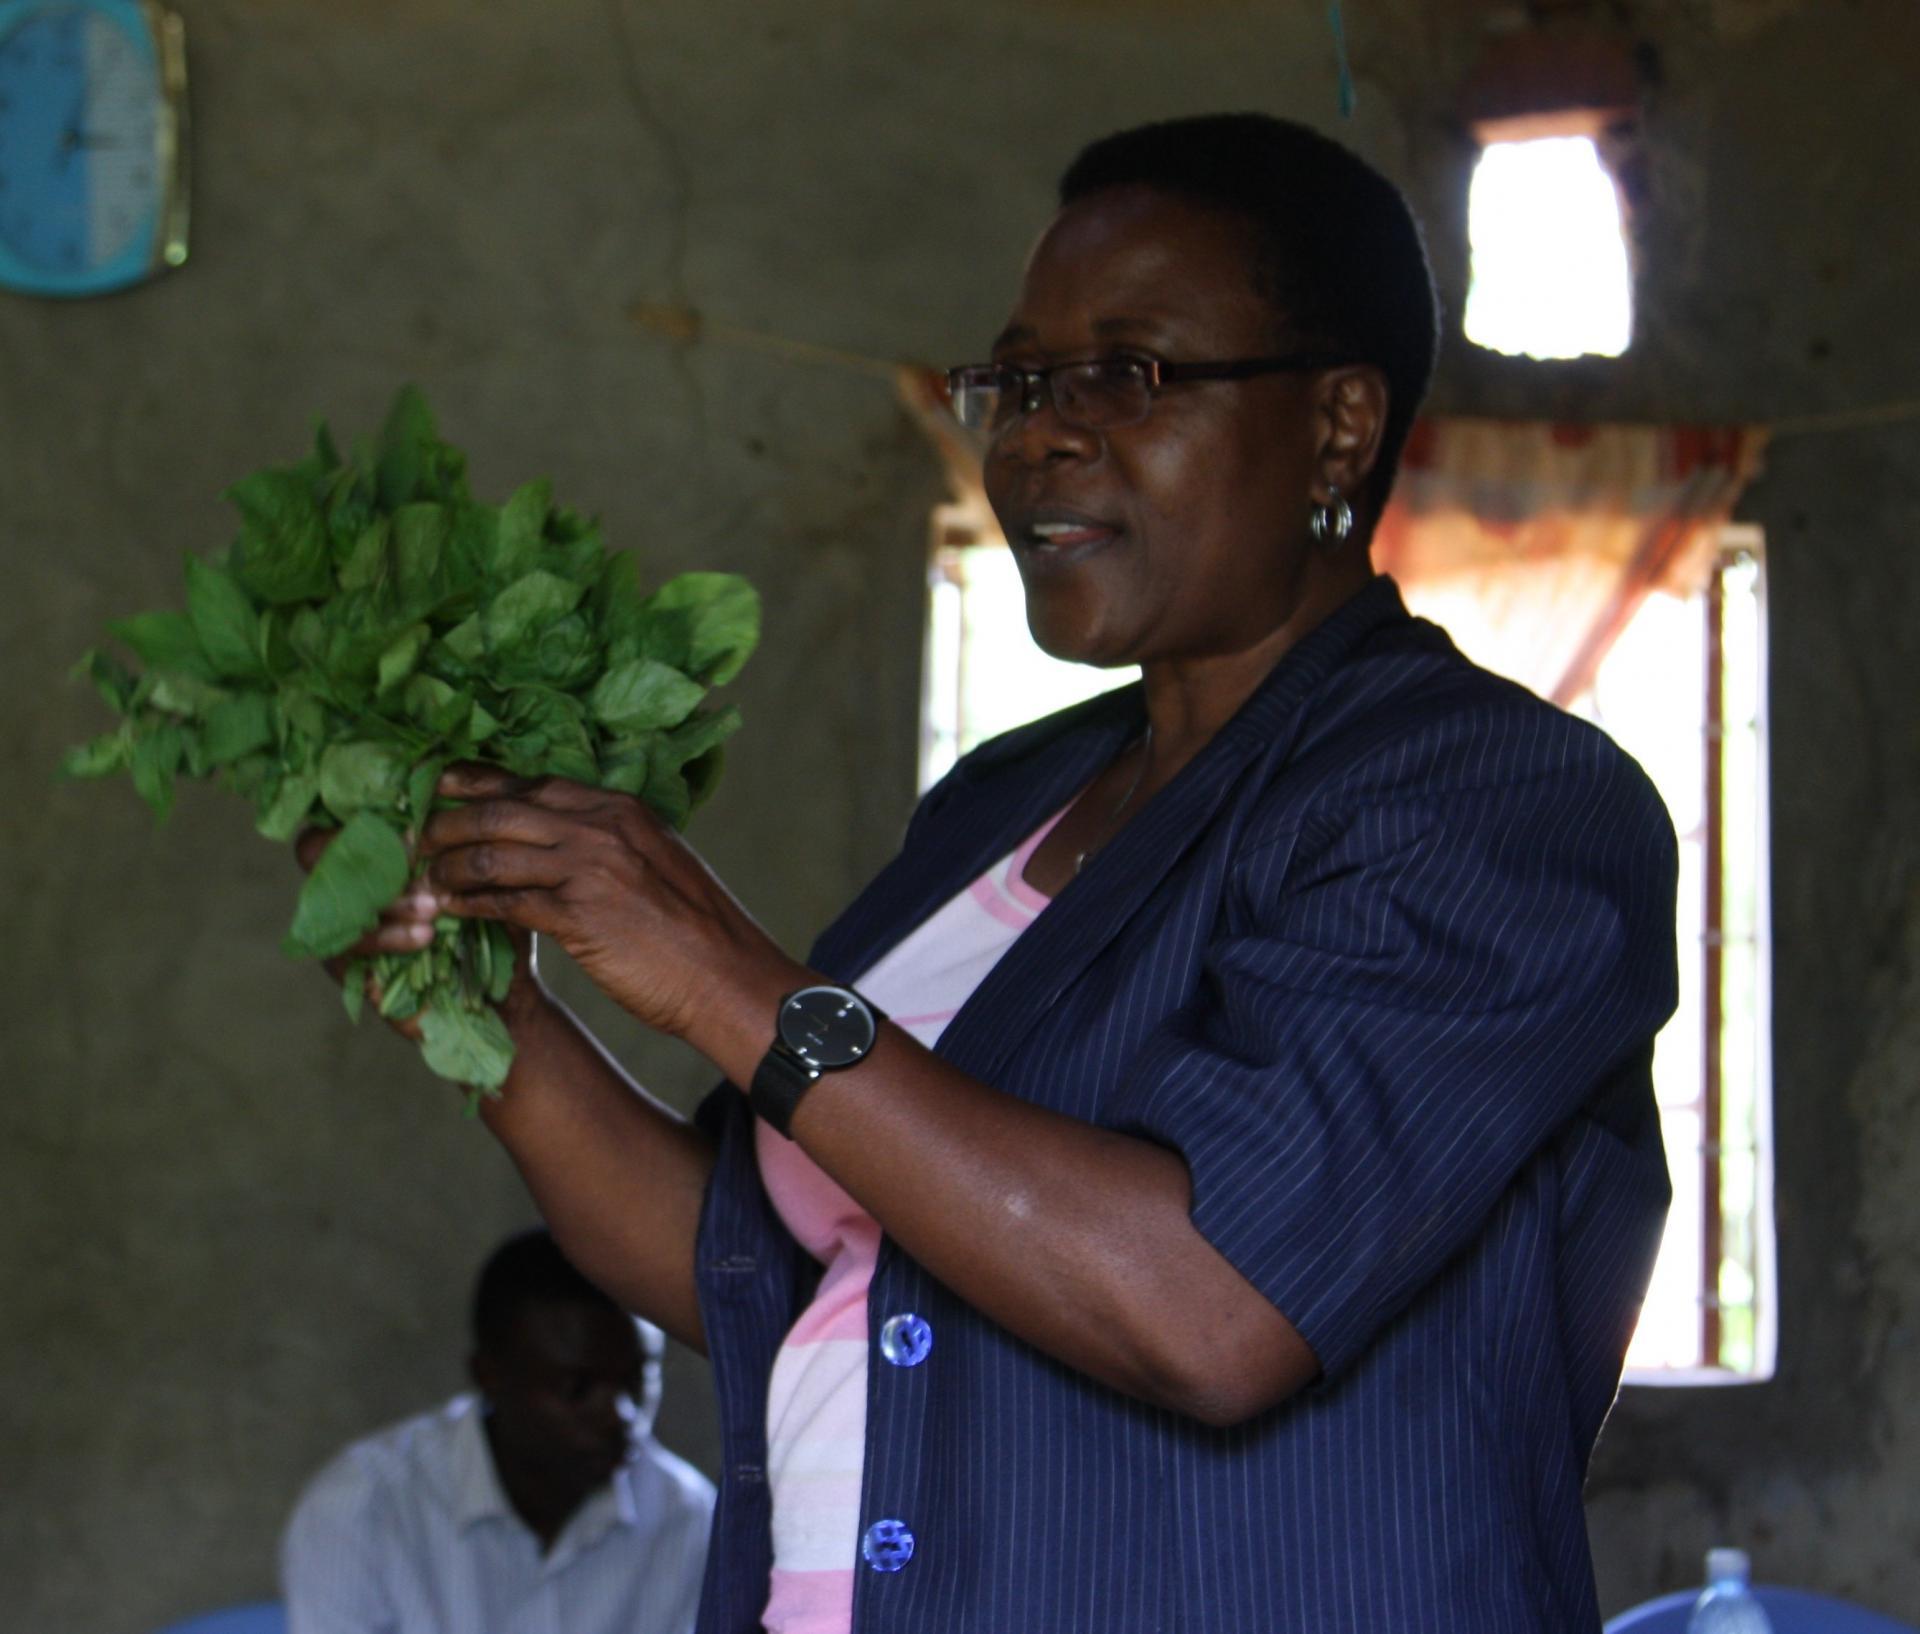 Dr. Marystella Wabwoba